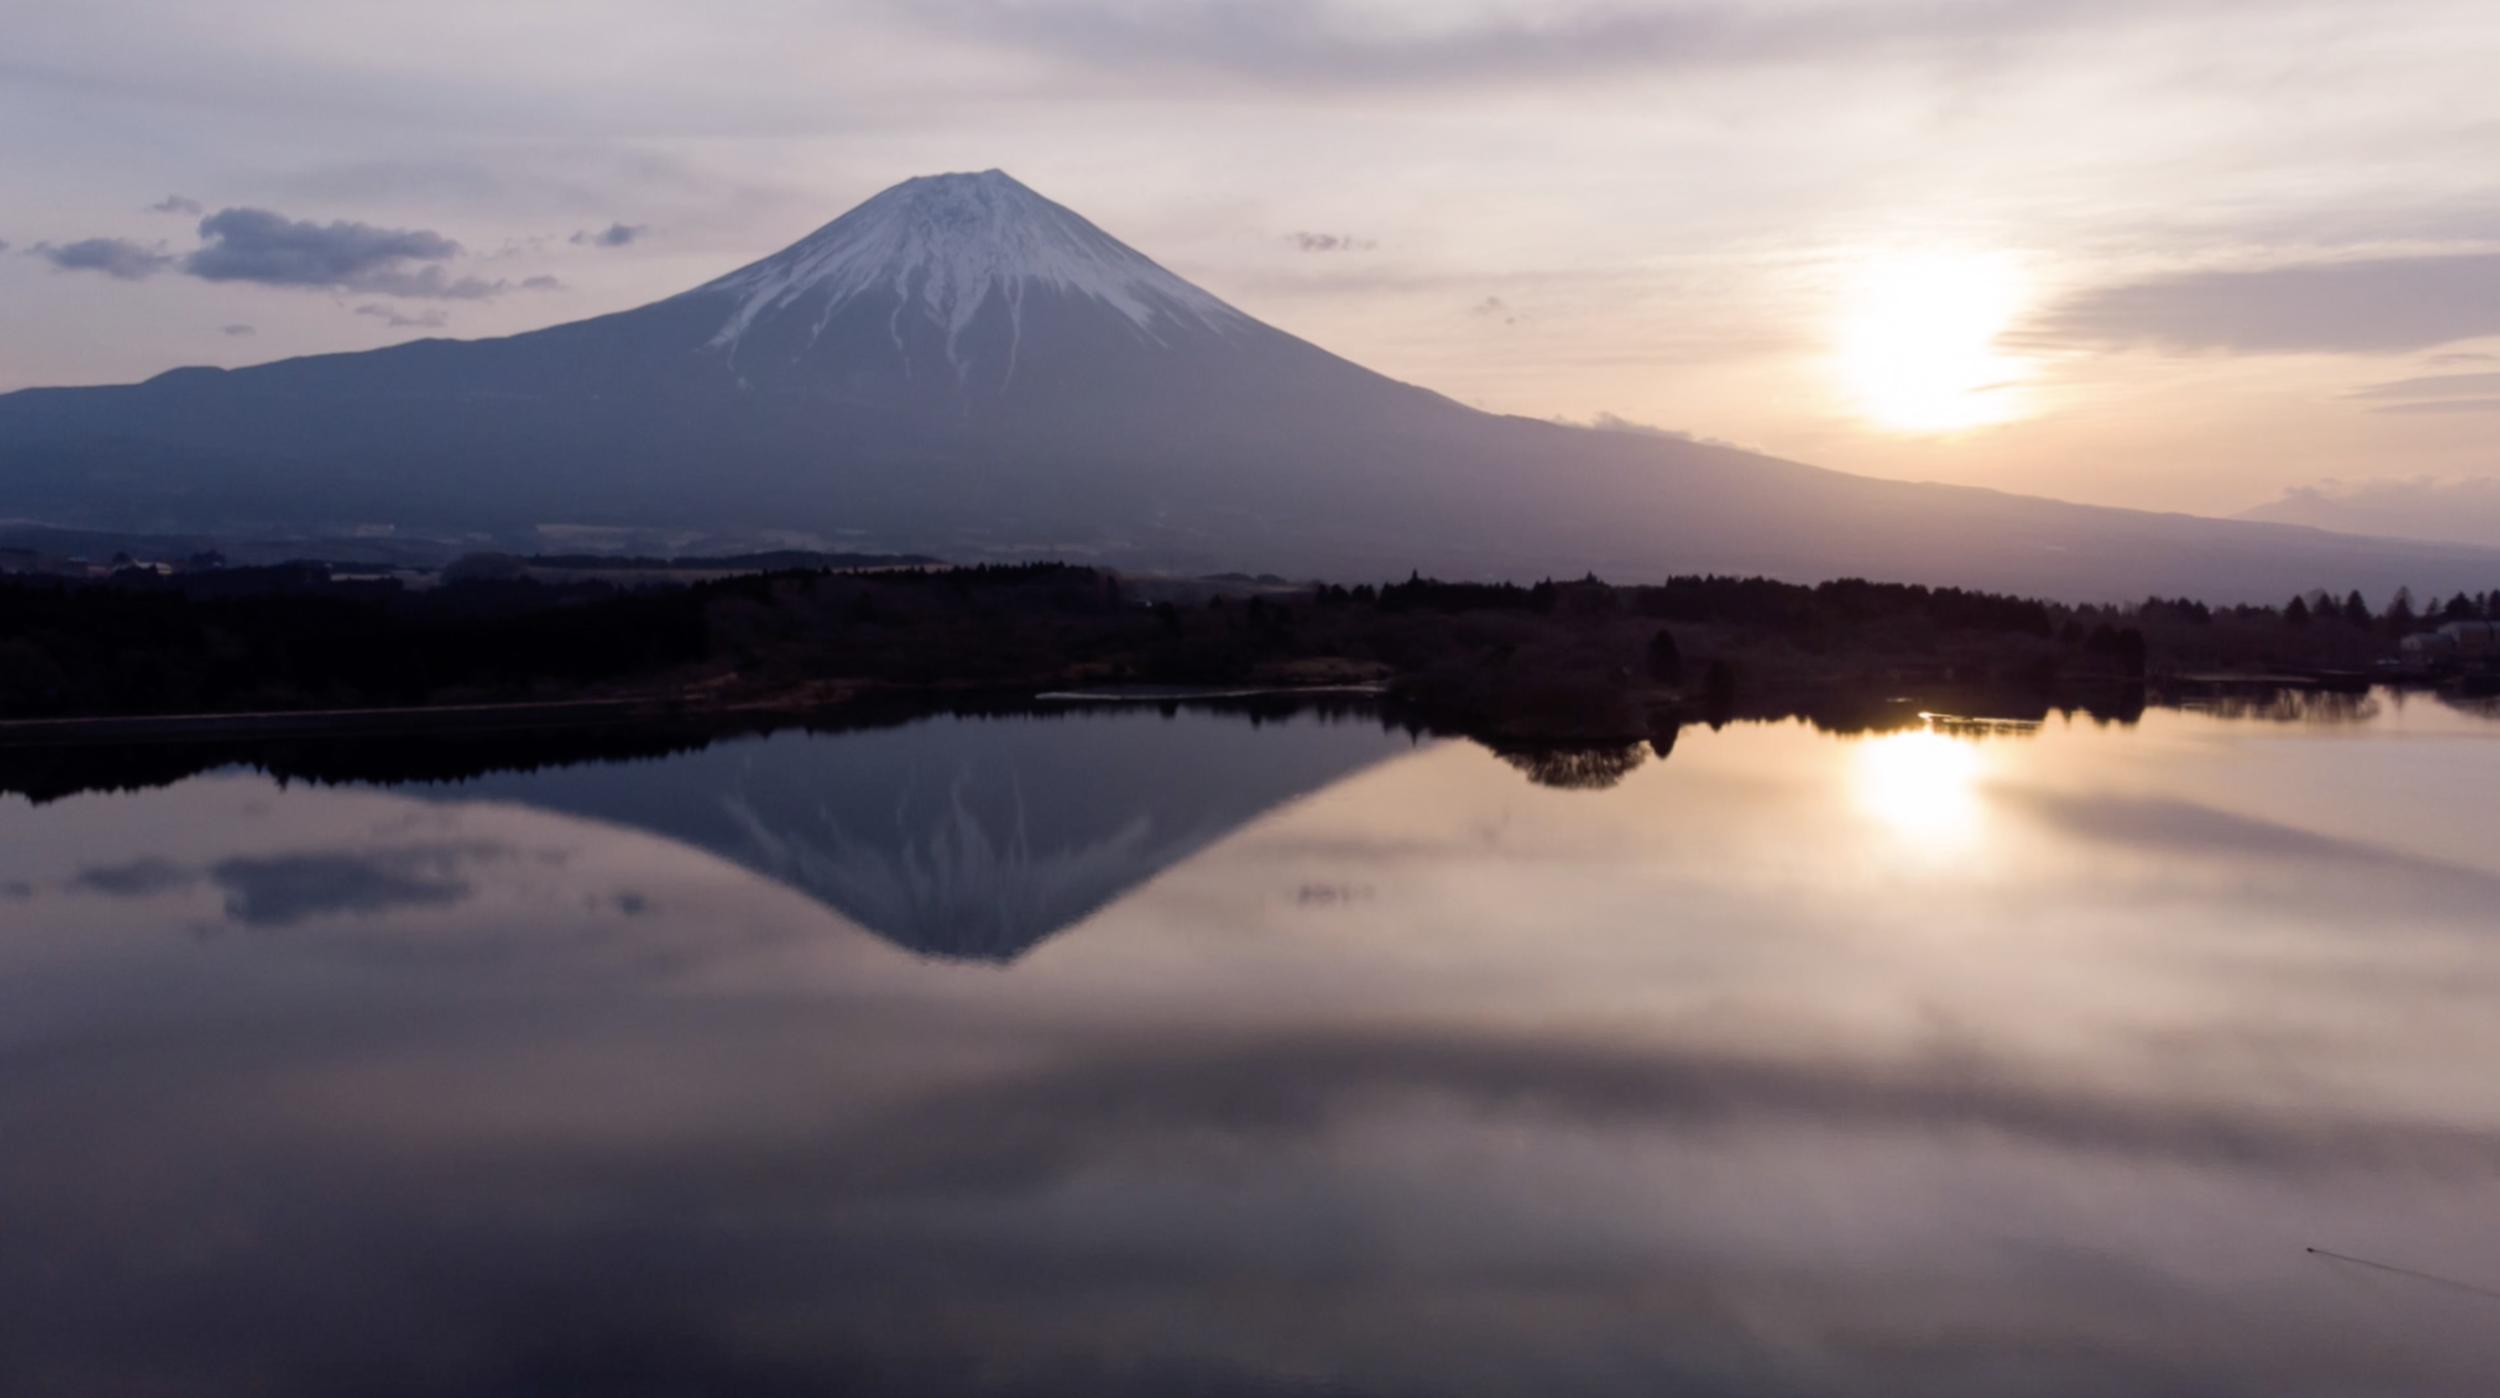 Regional PR video in Japan - 「せっかくだから全部の名所を入れよう」ではない